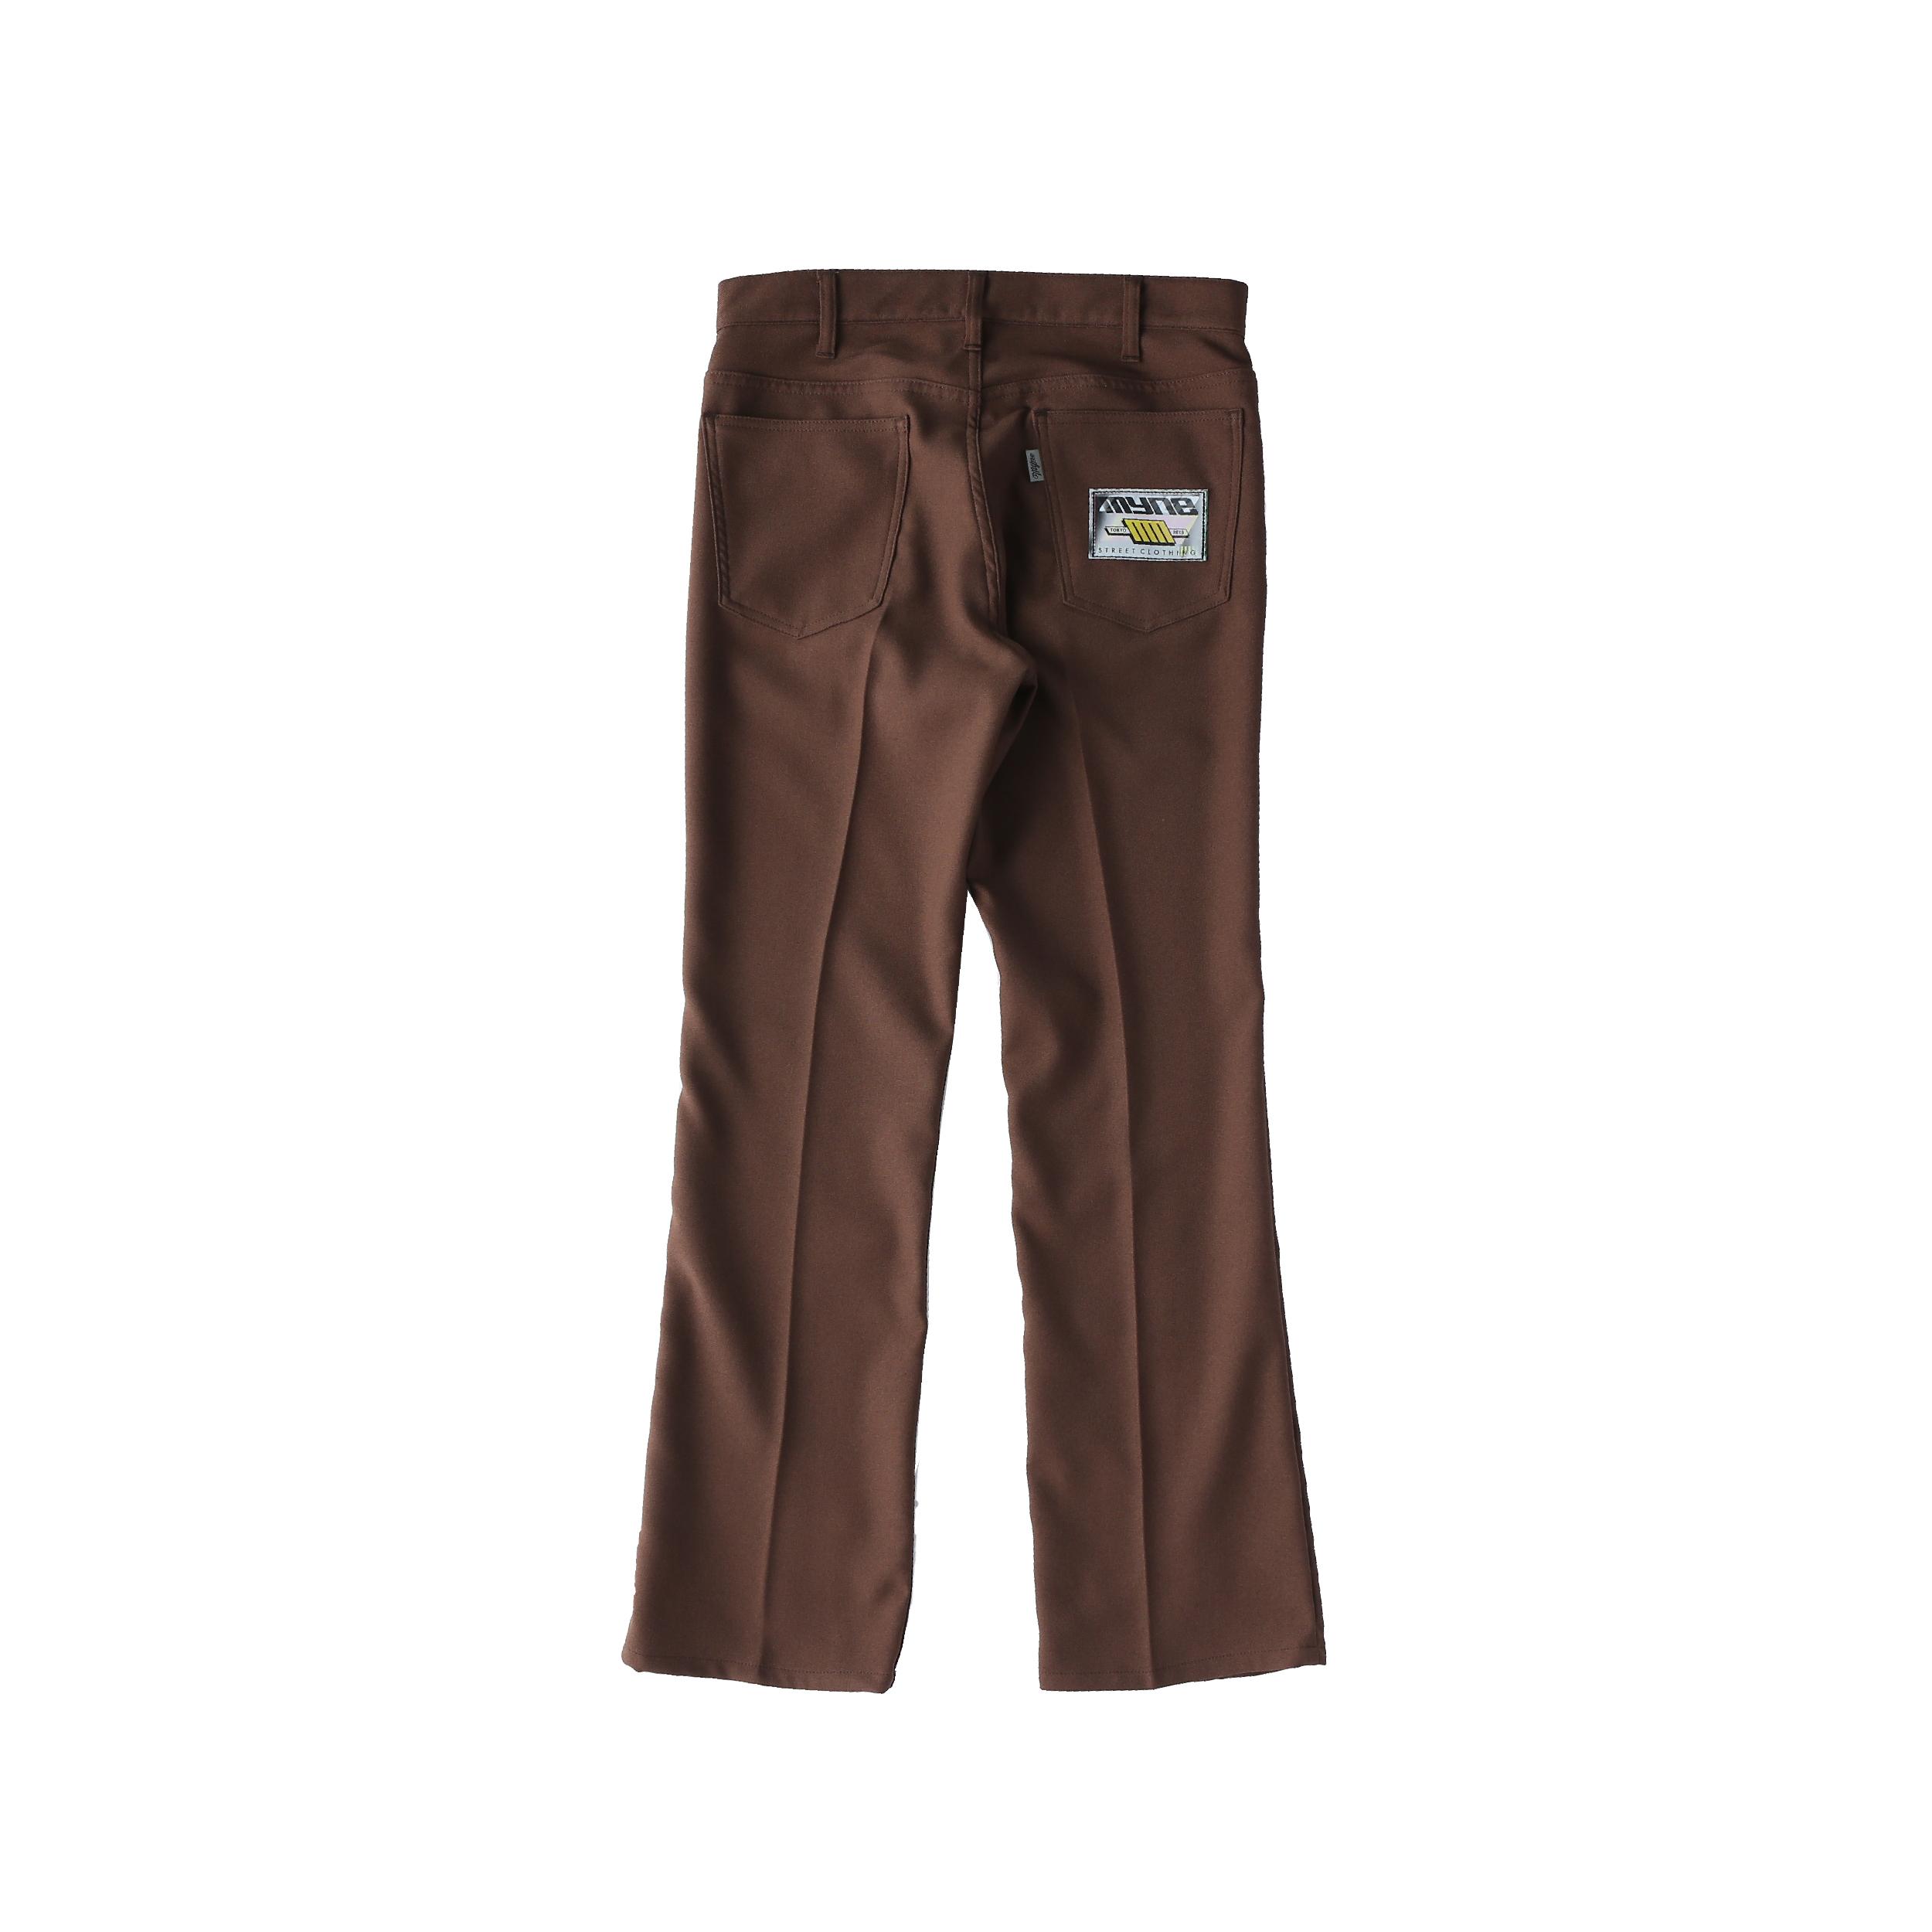 Wappen boot-cut pants / BROWN - 画像2